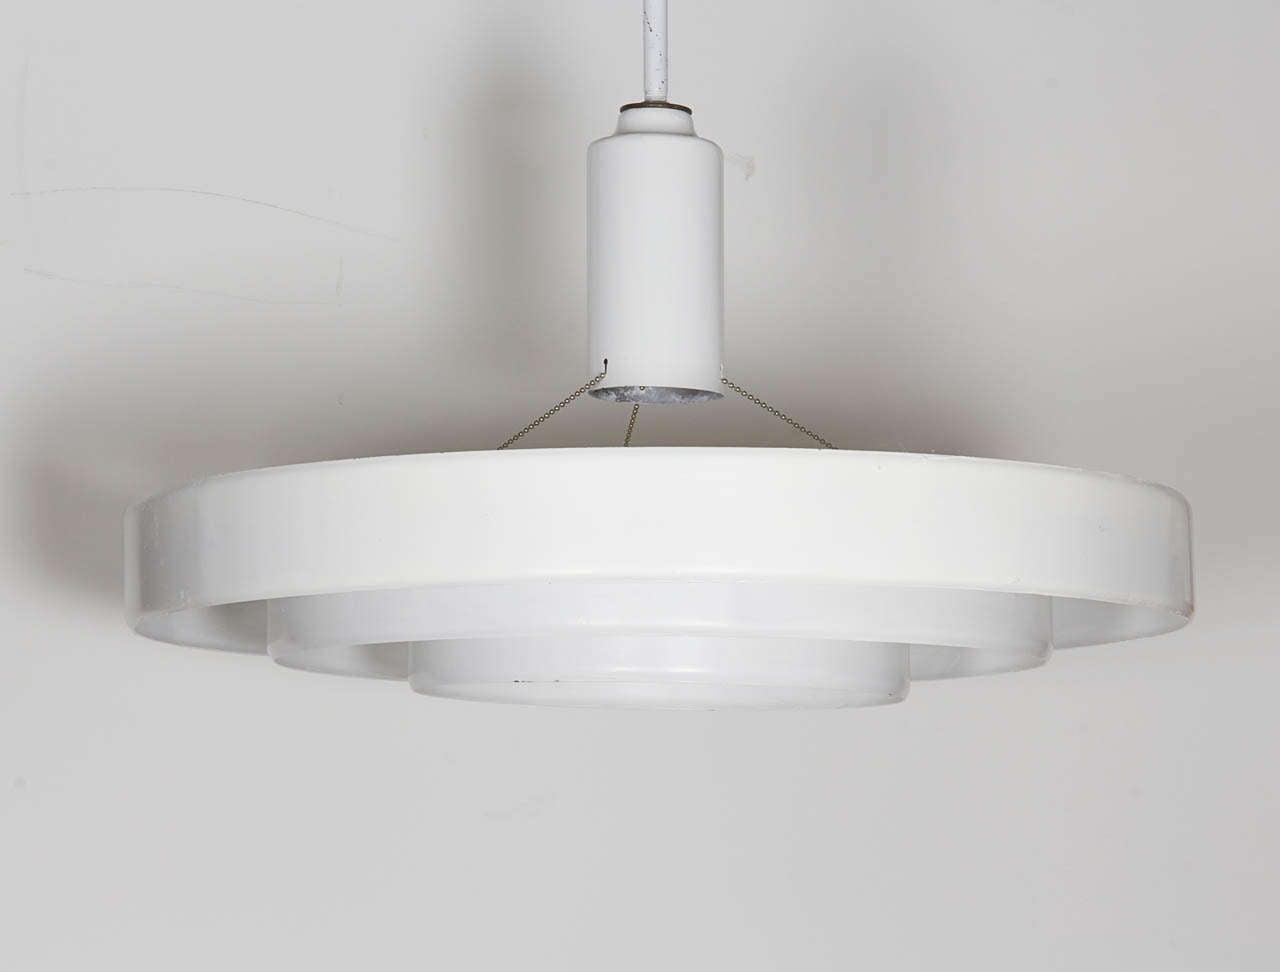 Minimalist White Three Tier Saucer Pendant Light Fixture By Prescolite